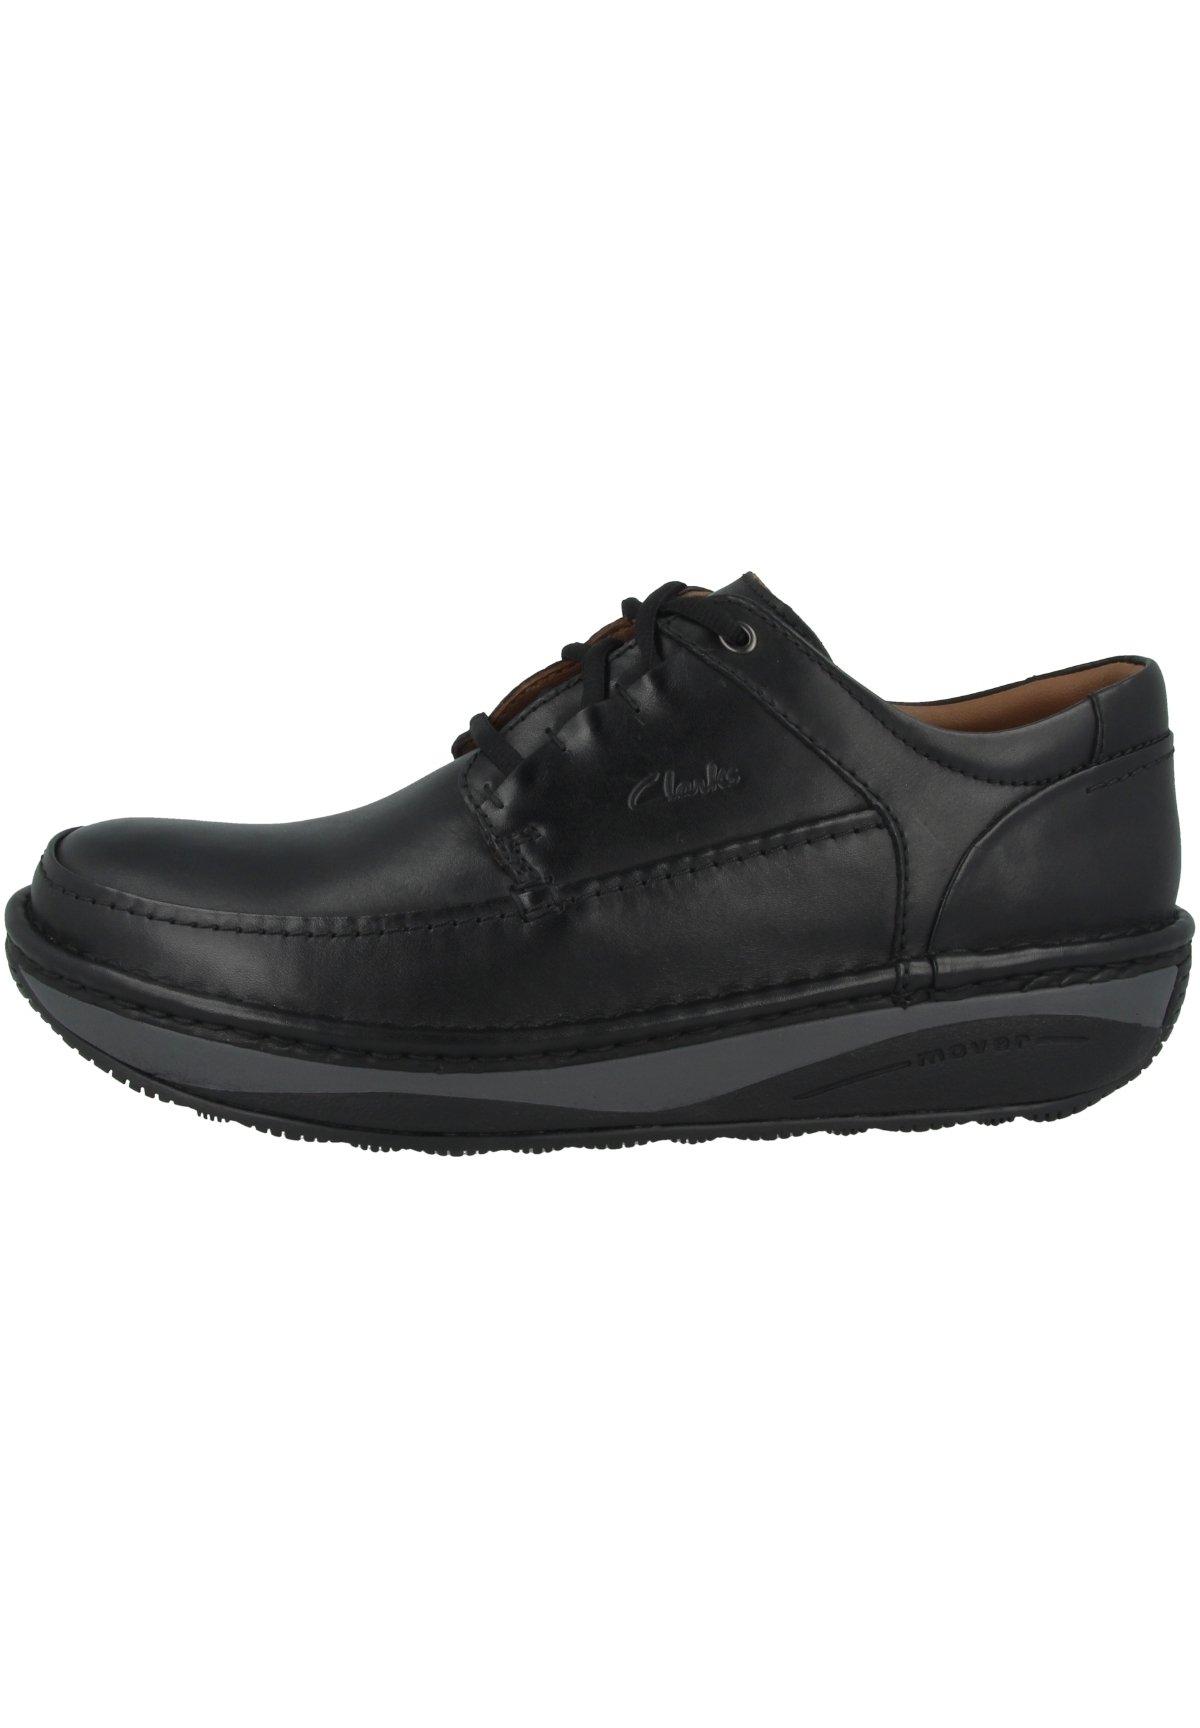 Homme SOUL - Derbies - black leather